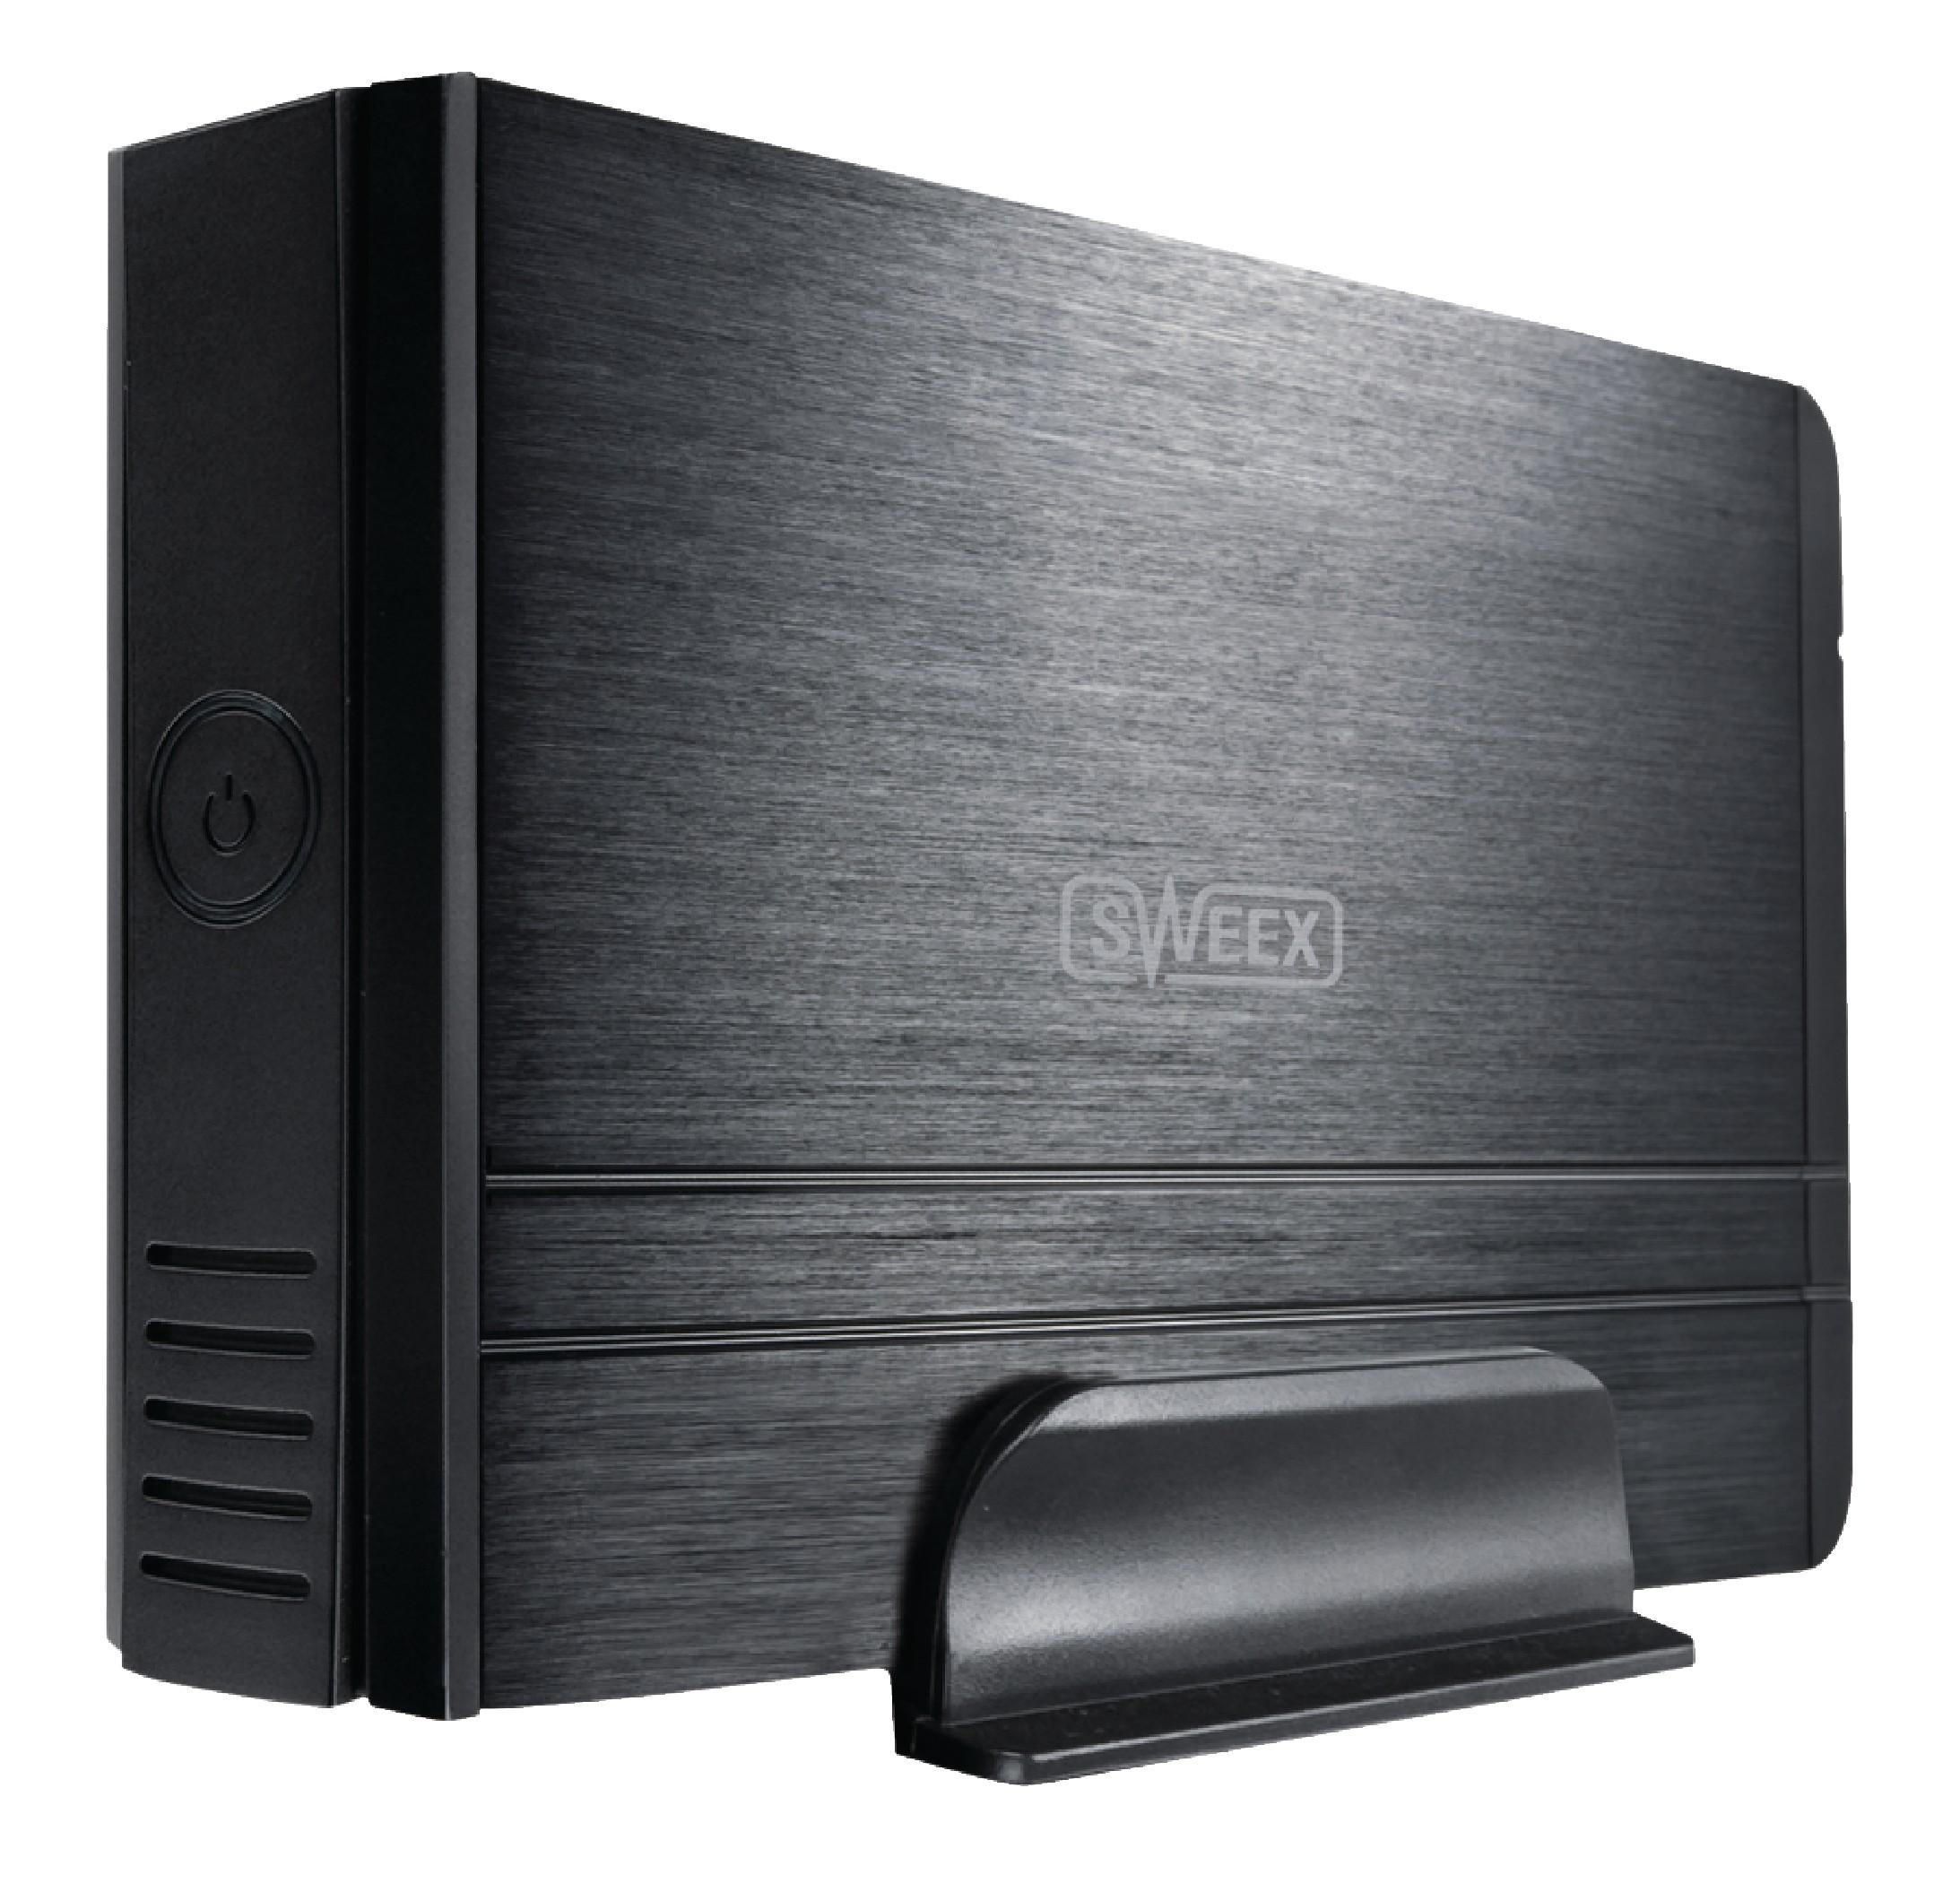 "Externí box Sweex pro pevný disk 3.5"" SATA USB 3.0, ST070"